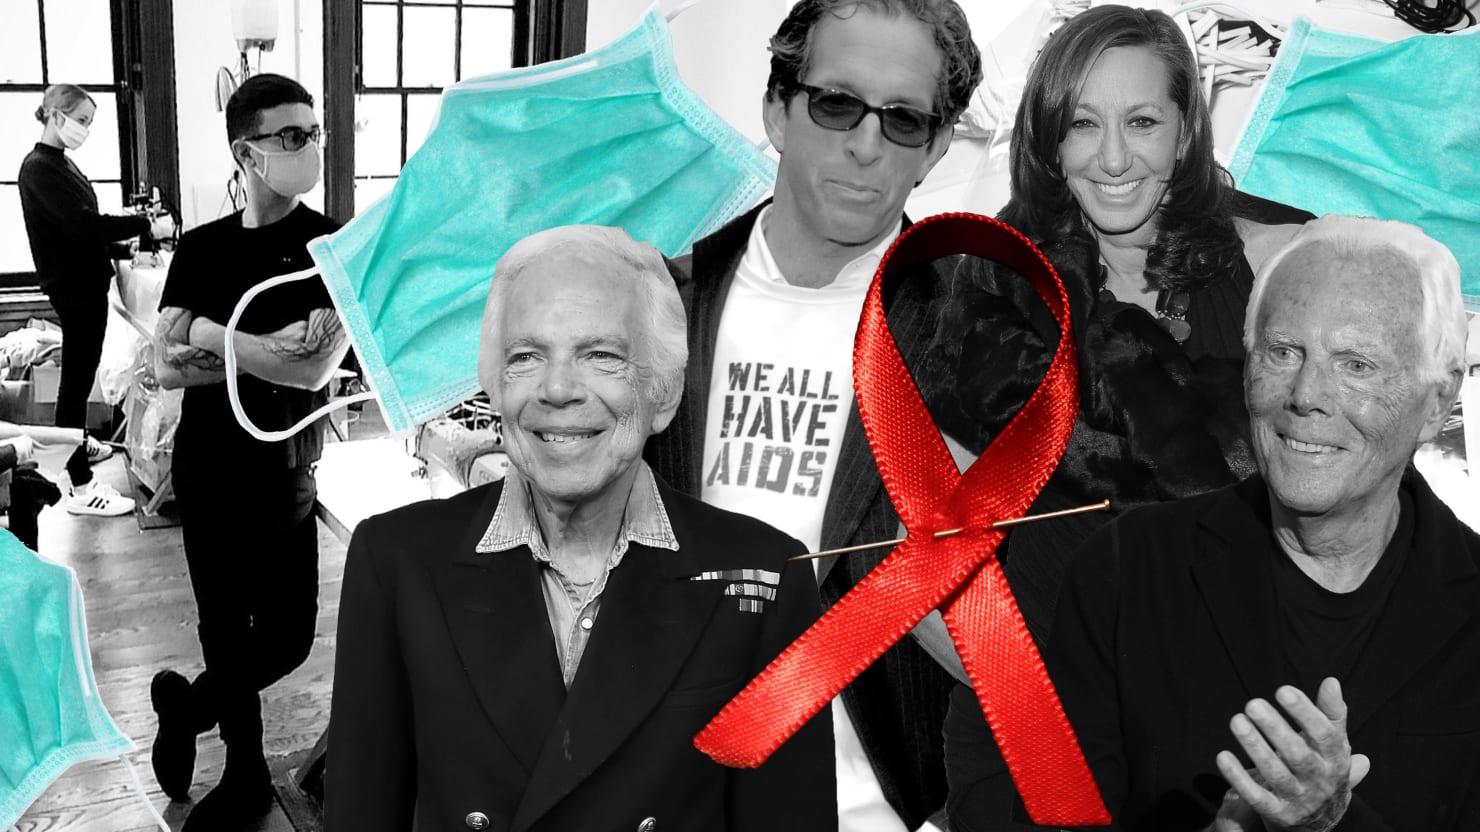 200327 alaina fashion aids coronavirus tease 2 mj00l6